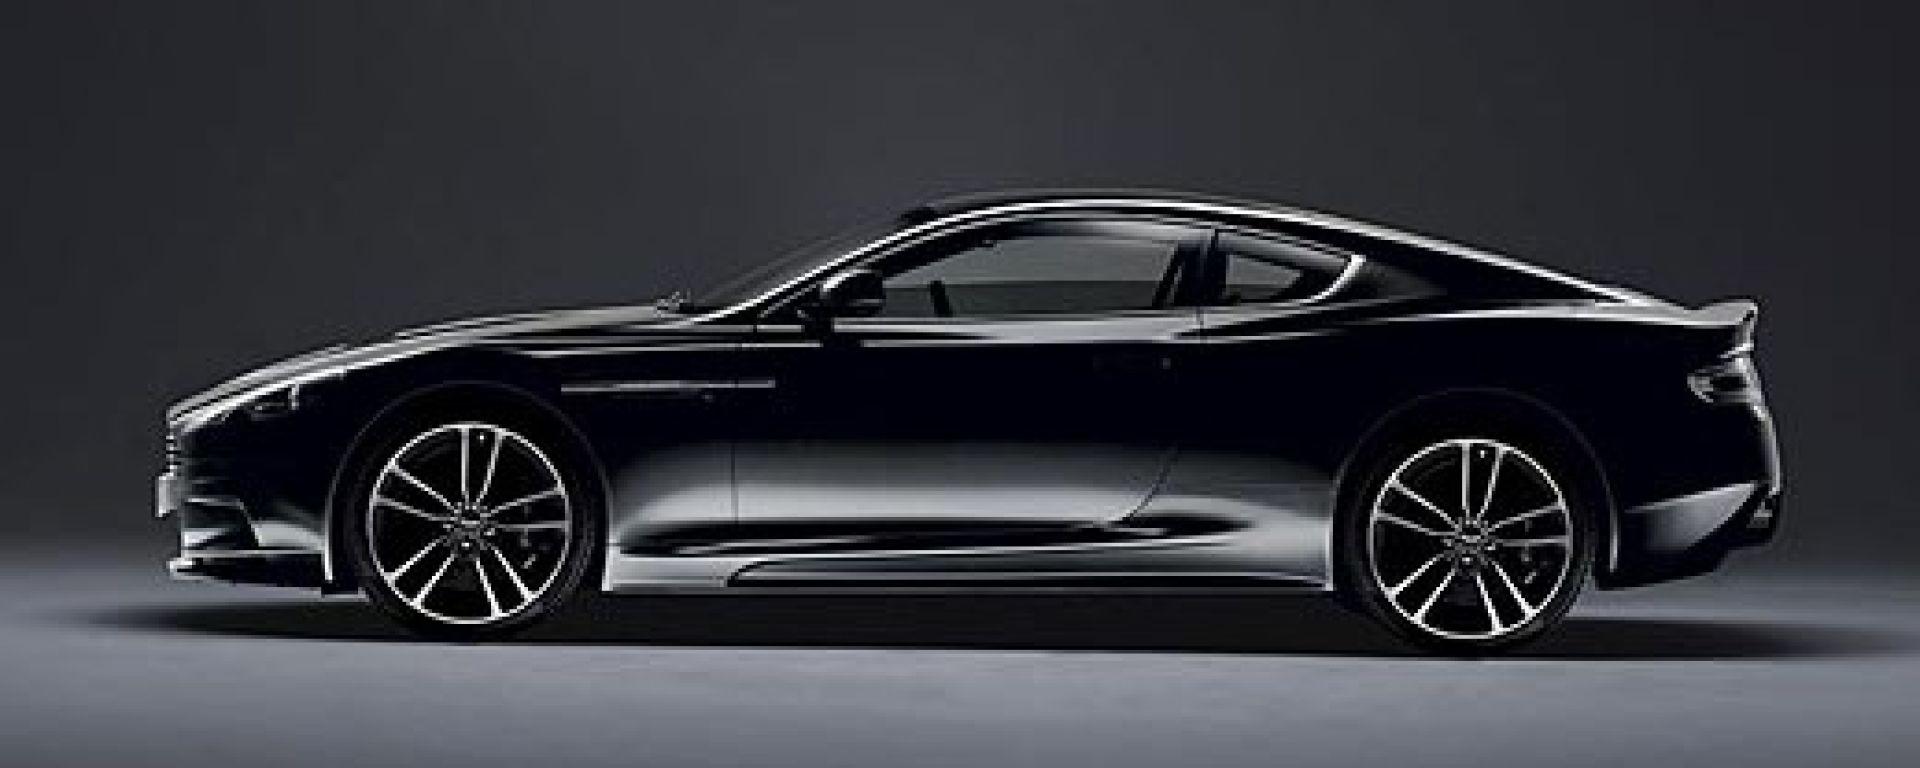 Aston Martin DBS e V12 Vantage Carbon Black